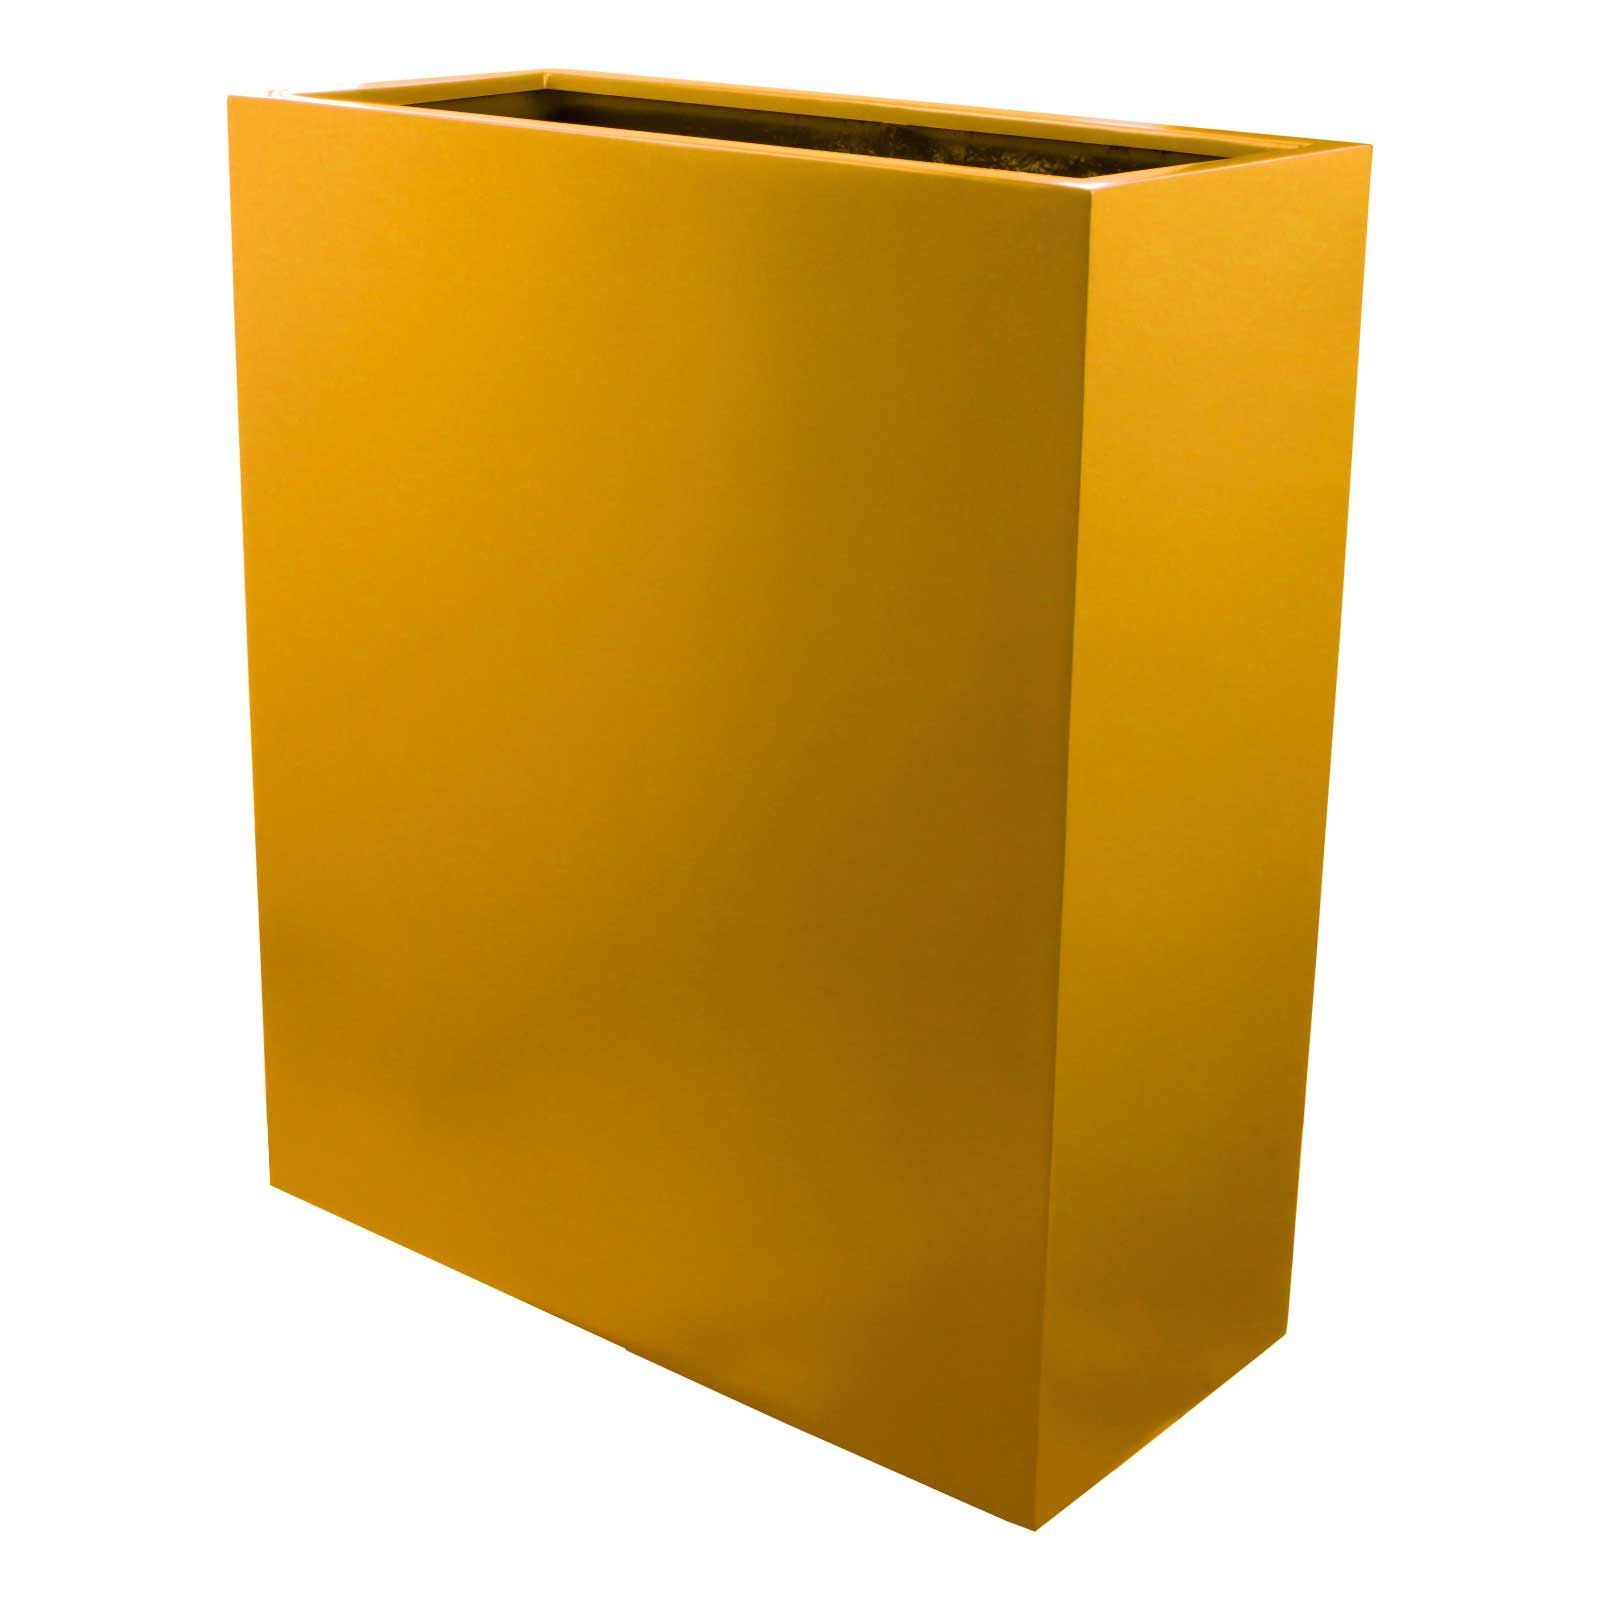 "Tall Planter Boxes Fiberglass 42"" Tall 36"" 48"" Length 16"